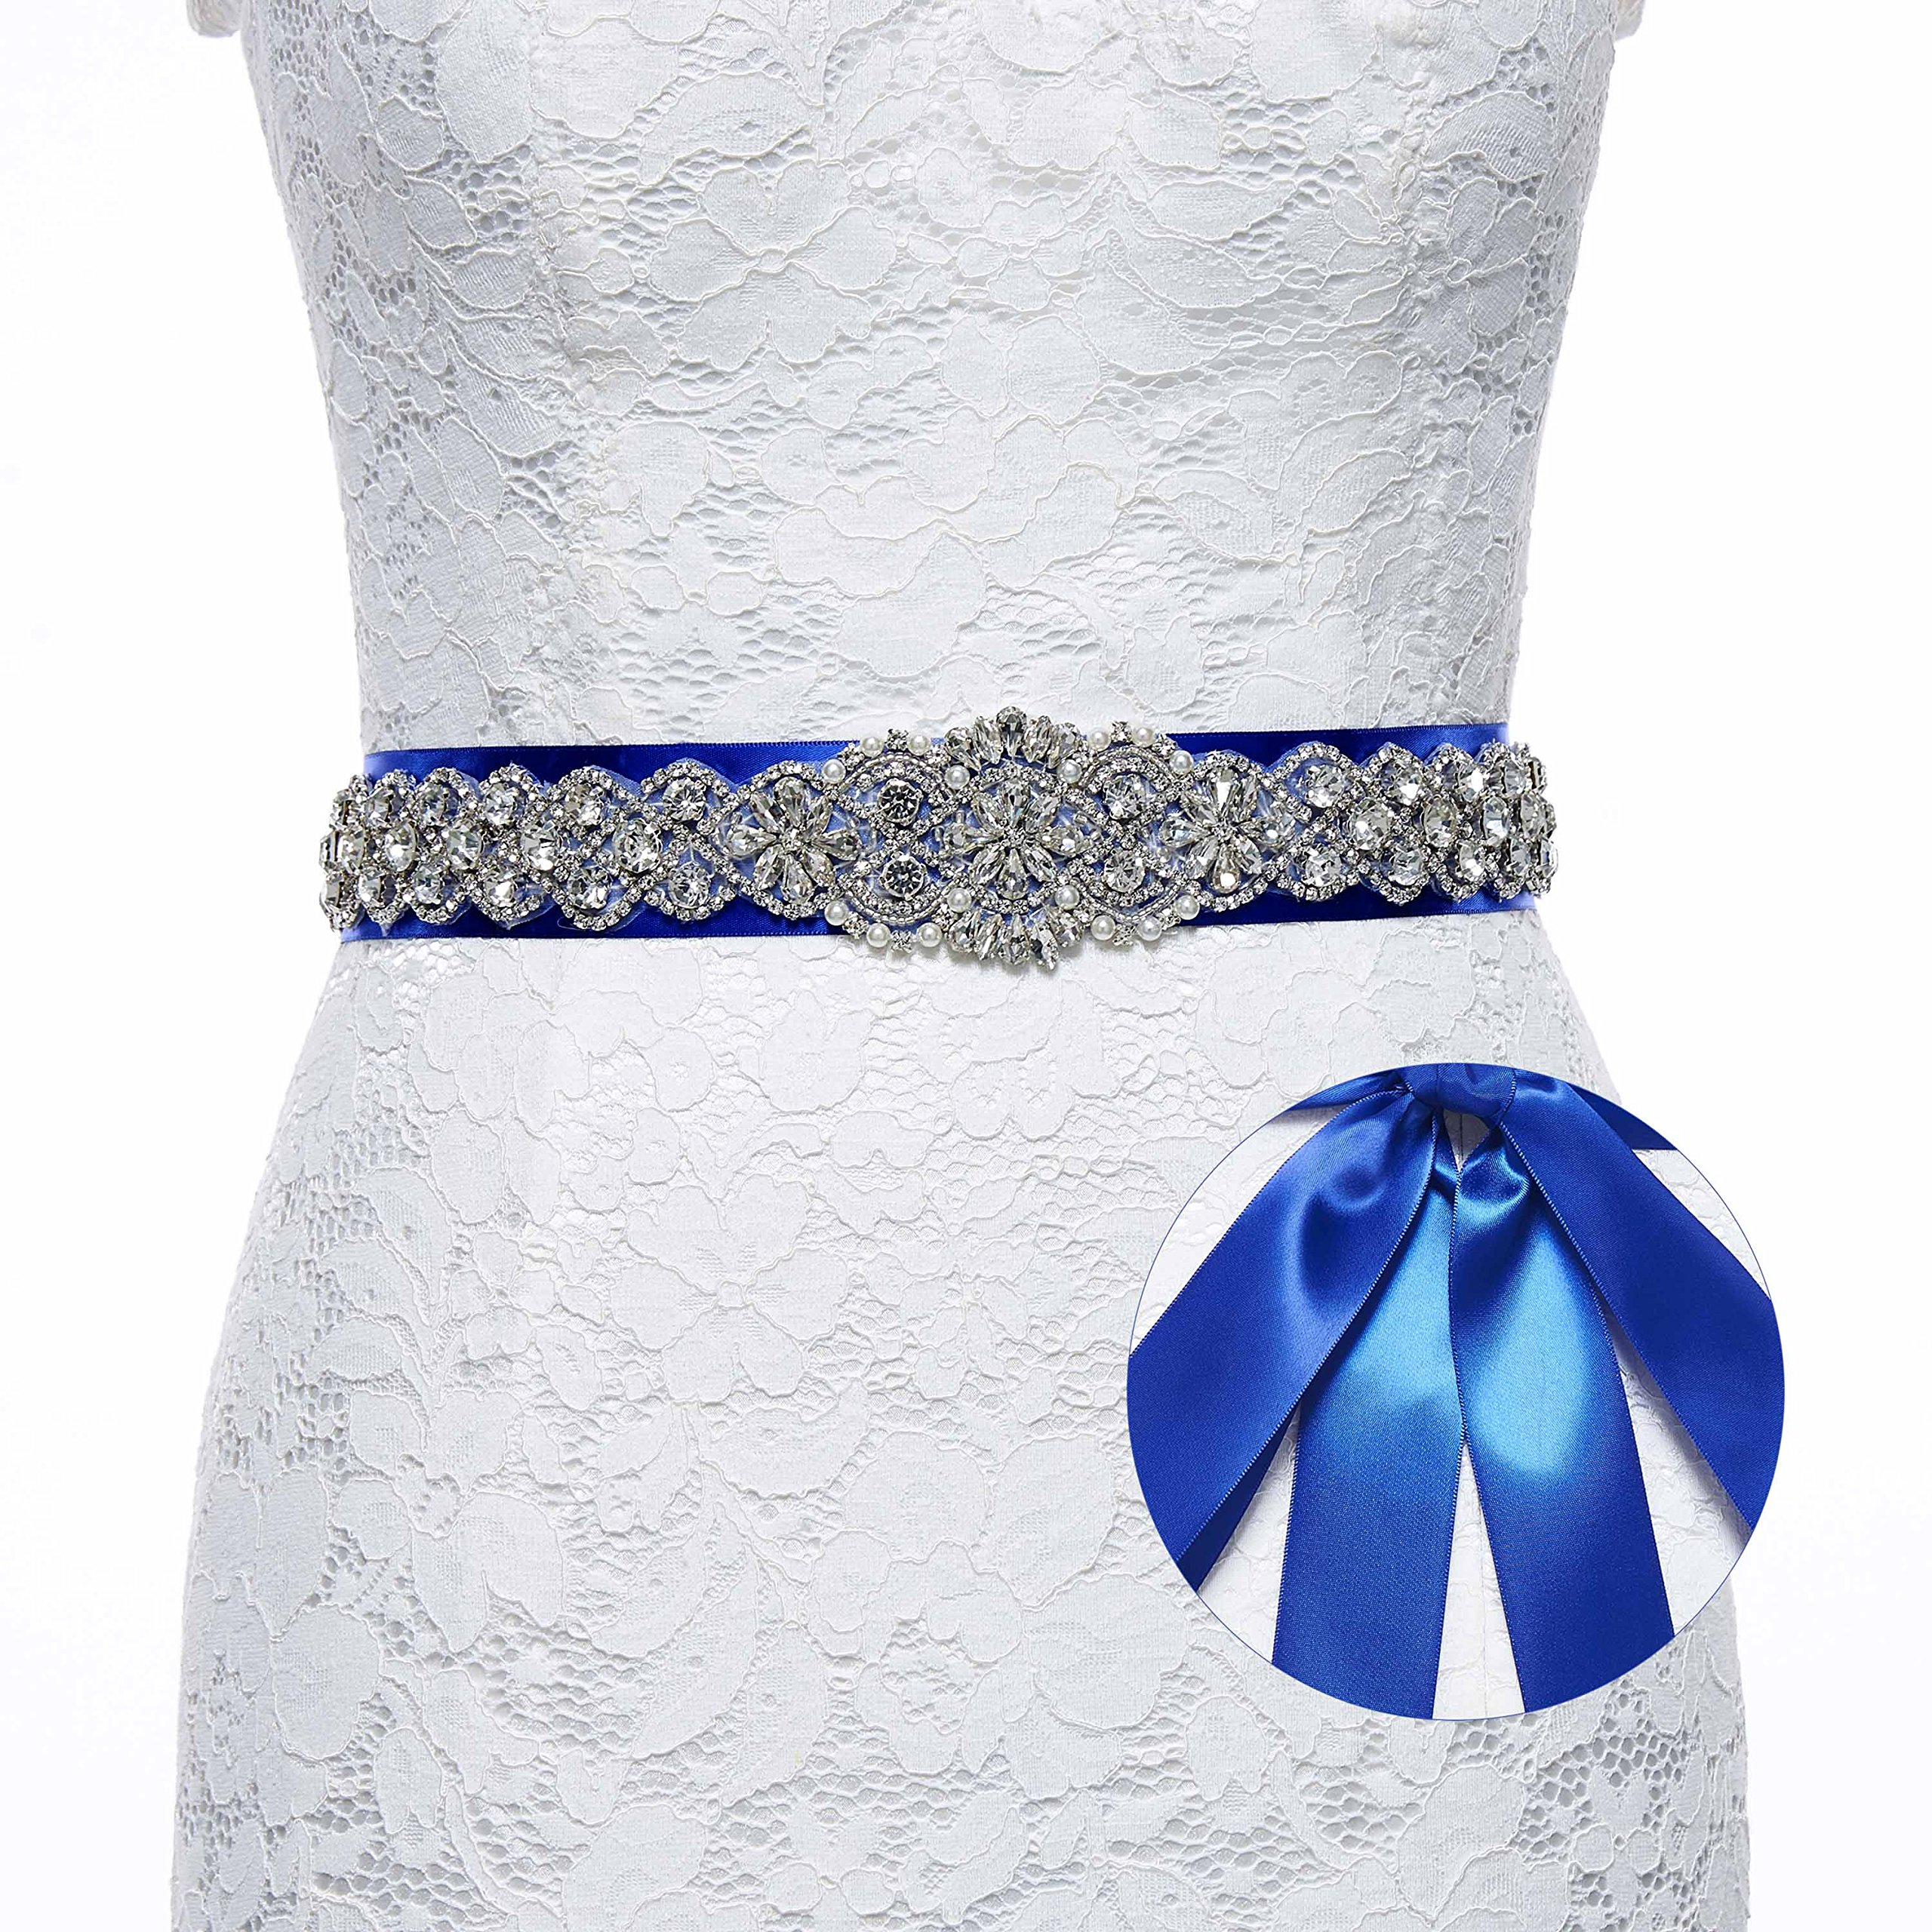 Sisjuly Pearl Rhinestones Sash Beaded Belts for Wedding Party Ball Prom Evening Dress Royal Blue